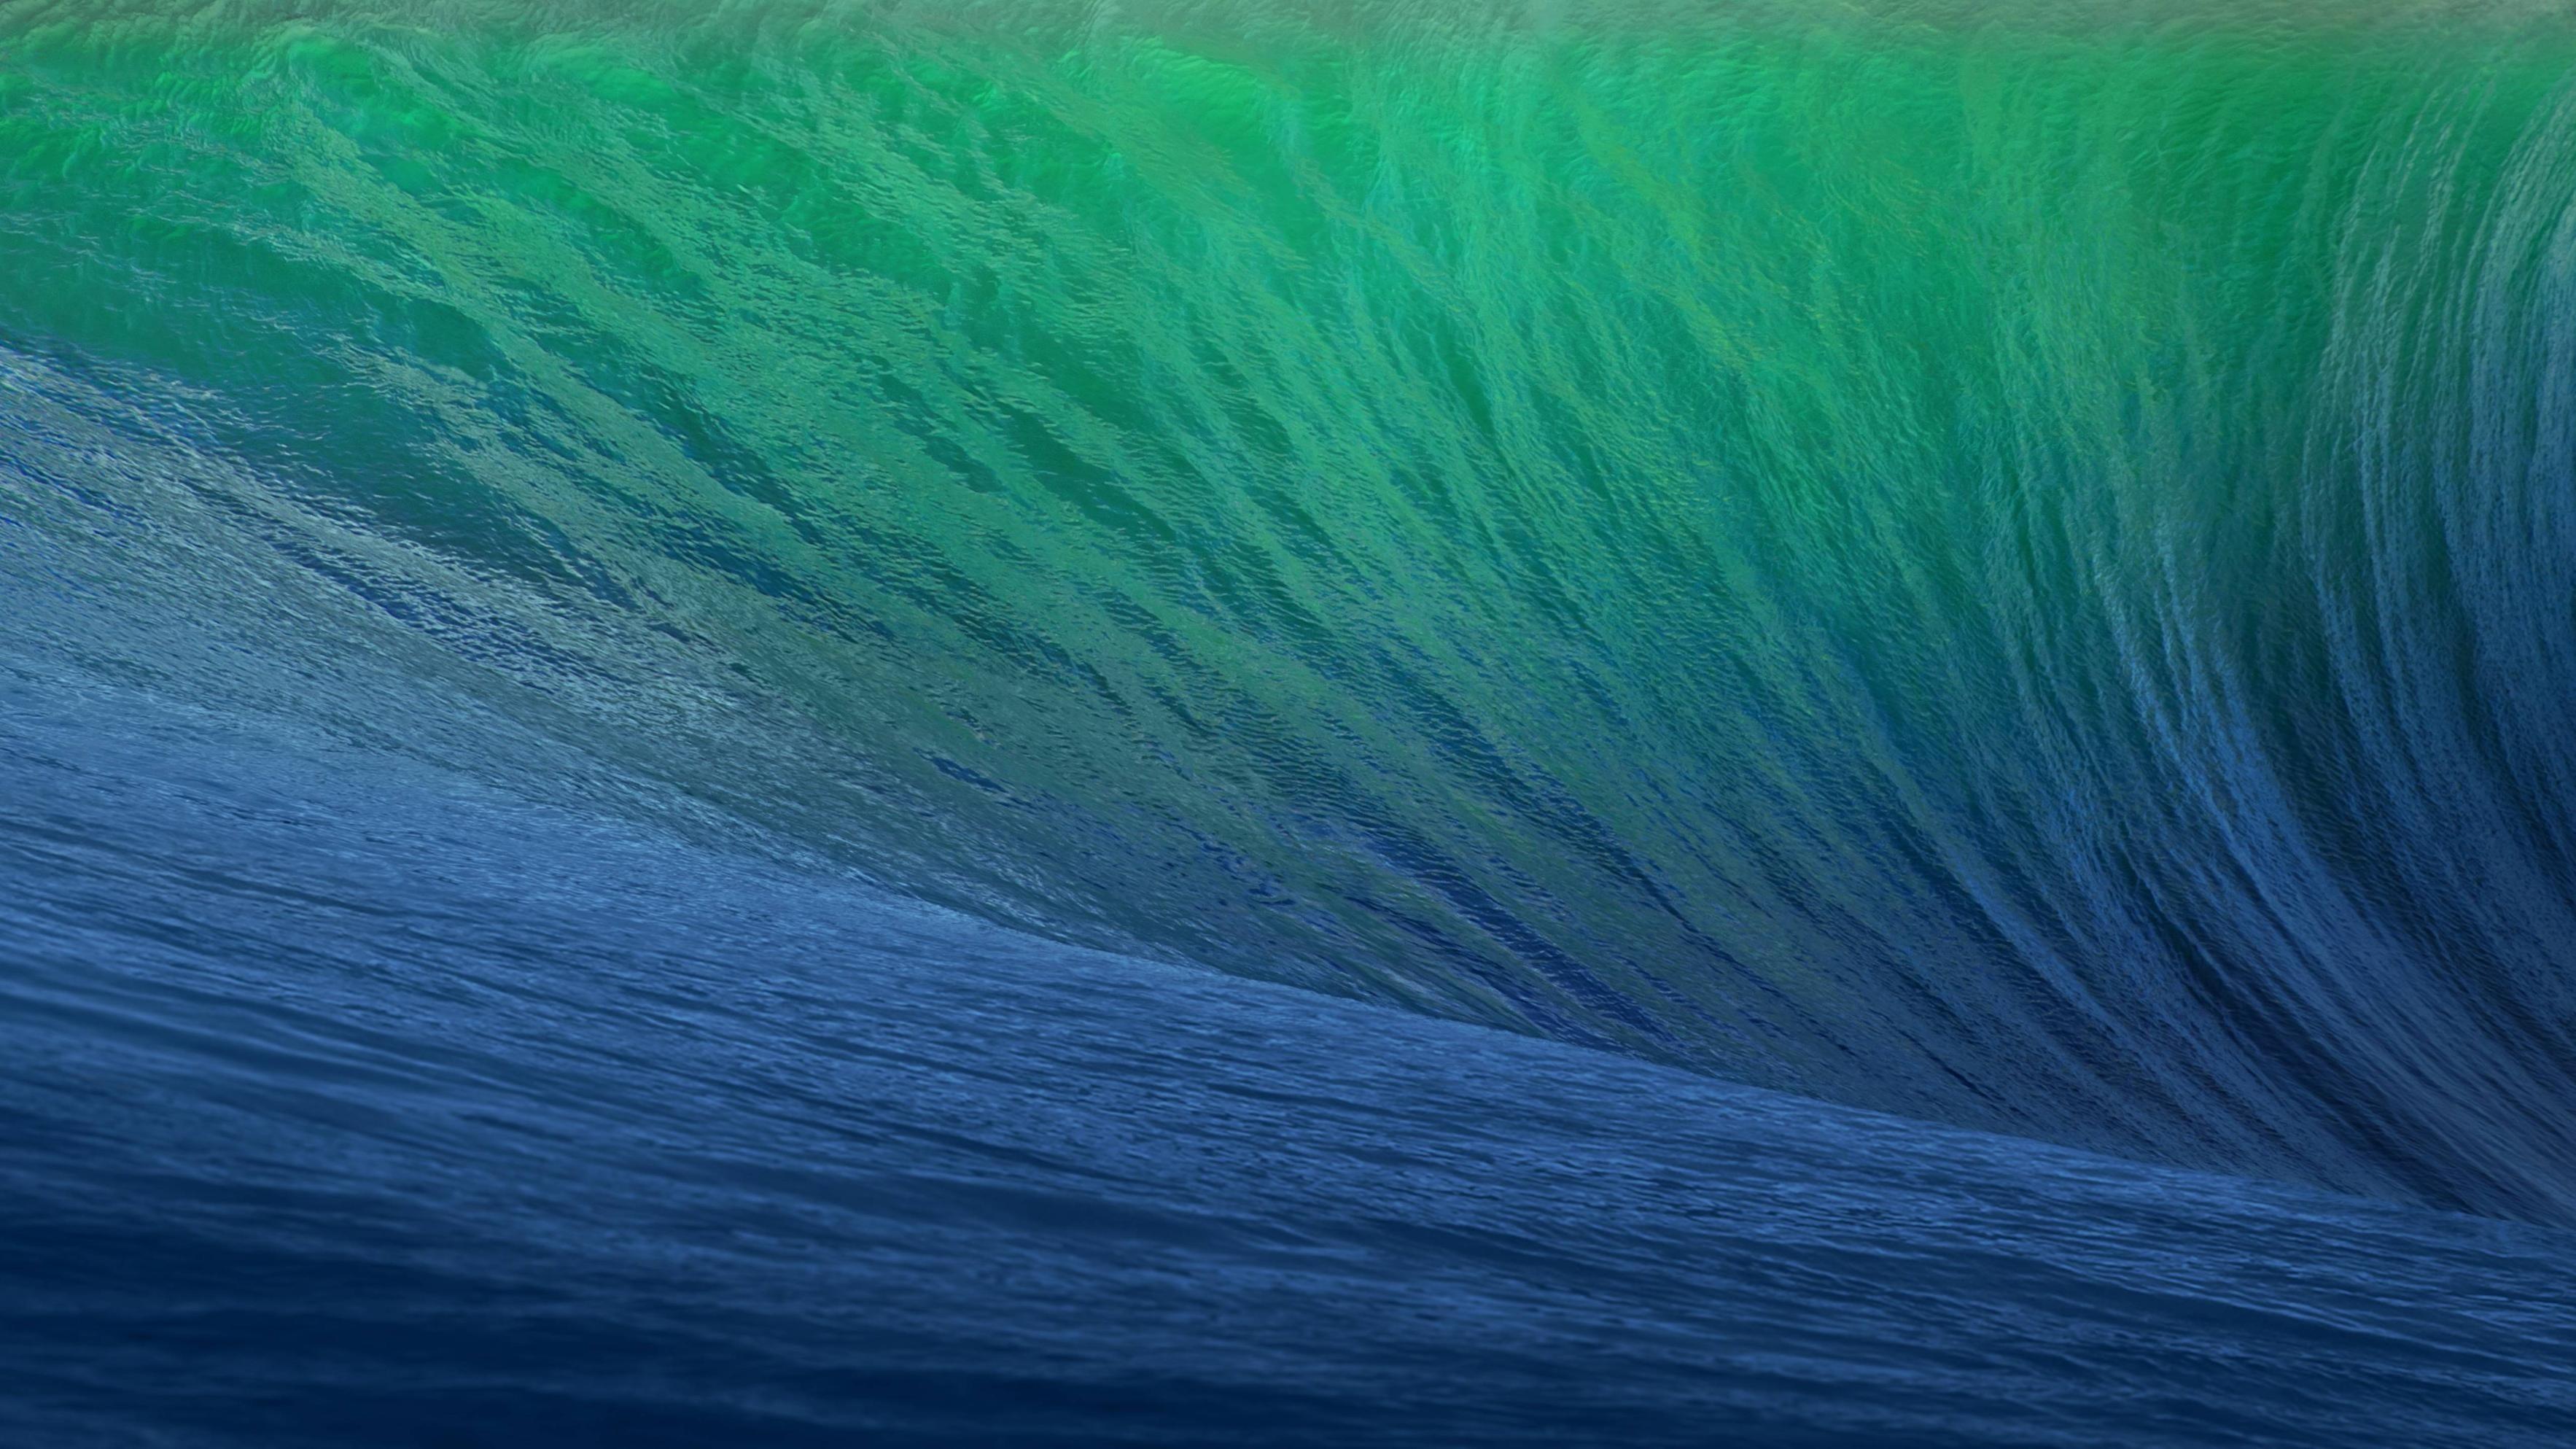 10.9 – Mavericks Wave picture